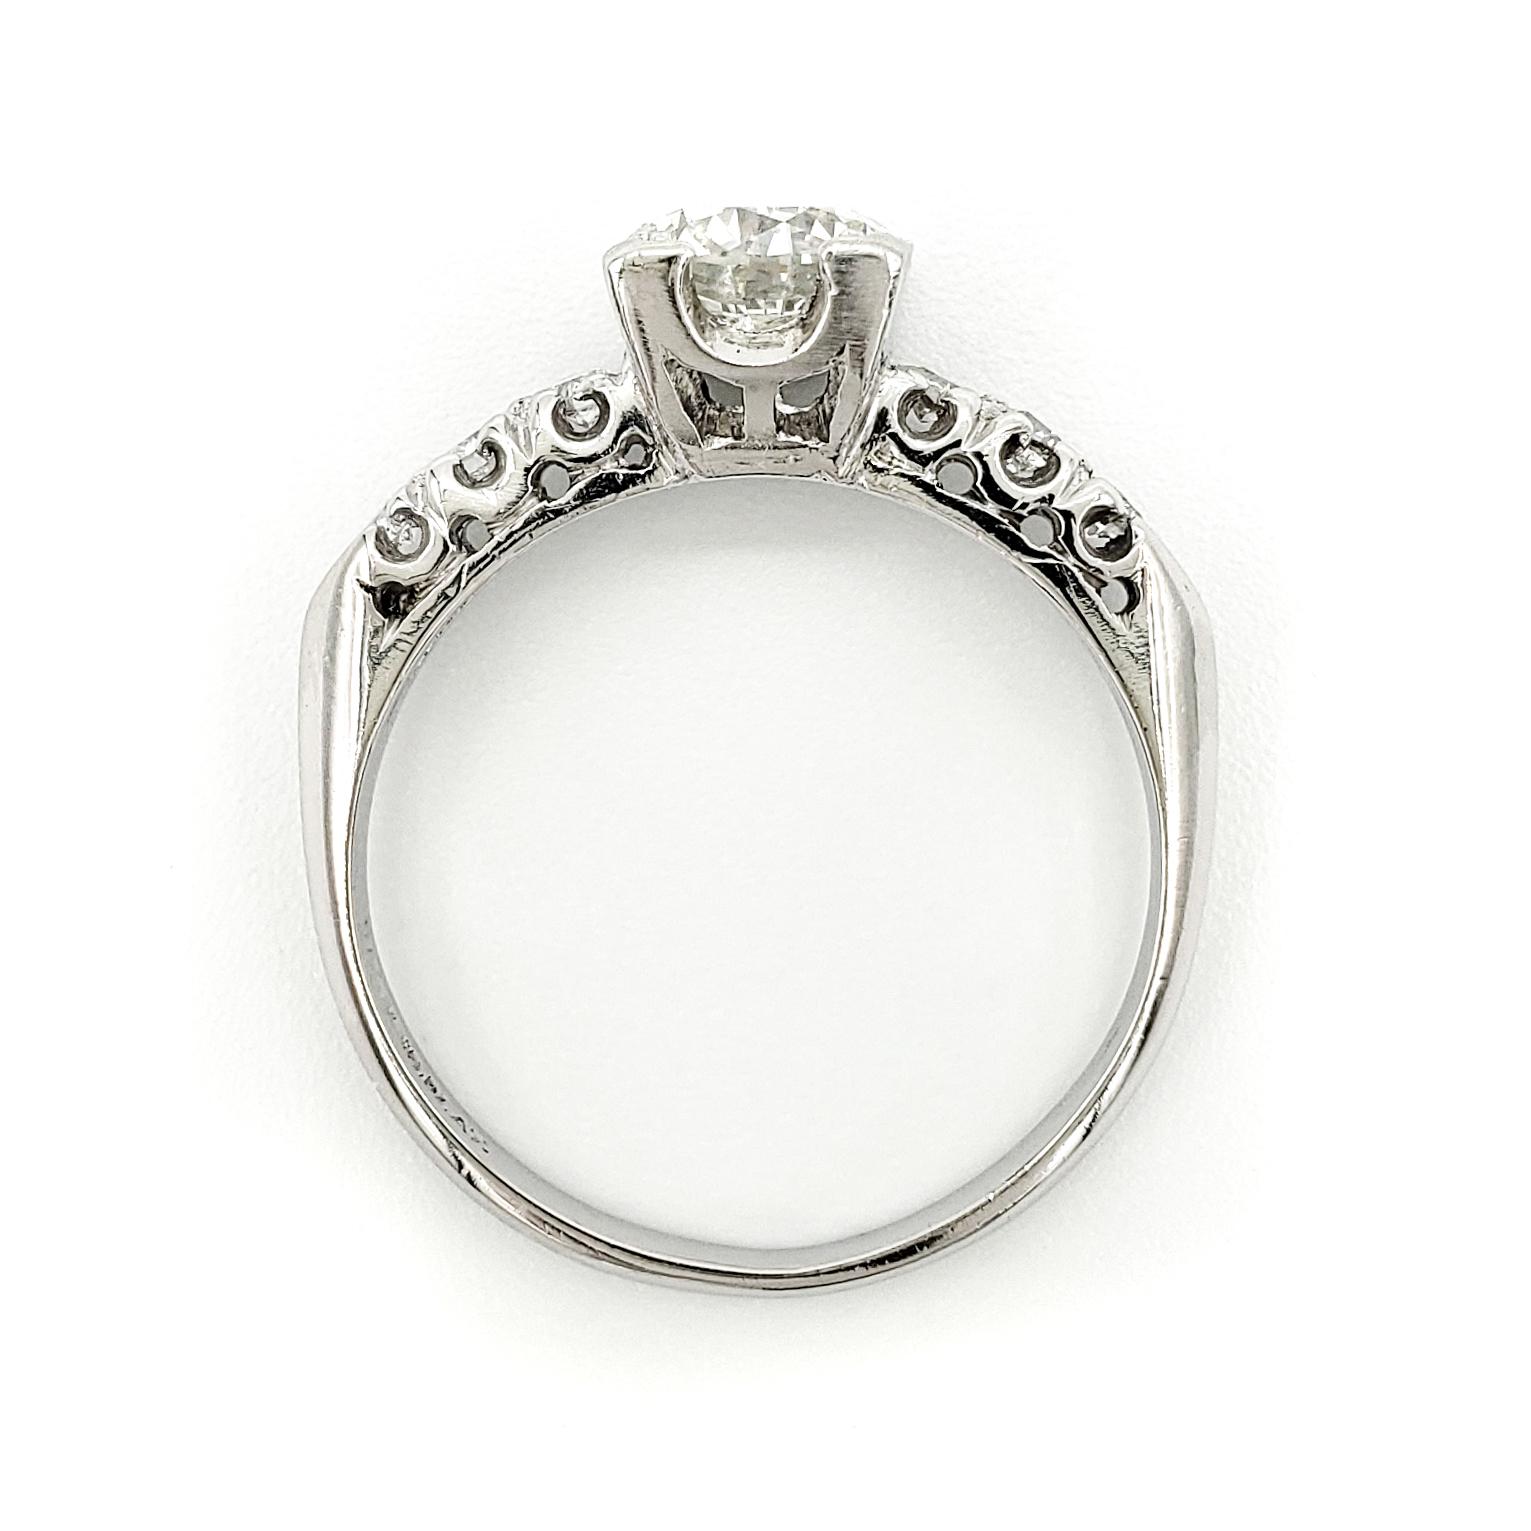 vintage-platinum-engagement-ring-with-1-01-carat-old-european-cut-diamond-egl-h-si1-2